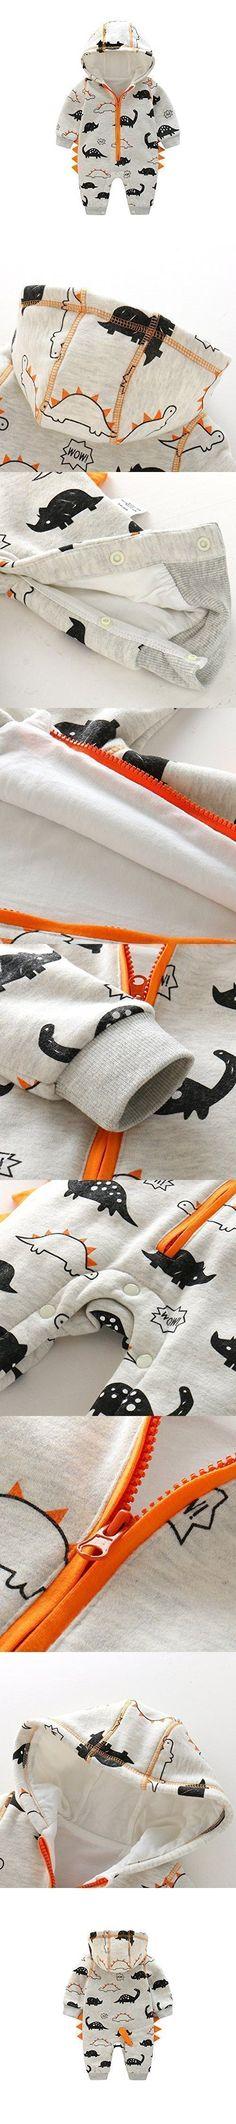 Newborn Baby Boy Baby Girl Unisex Clothes Long Sleeve Dinosaur Hoodies Winter Warm Romper outfit 3-6 months #babyboyhoodies #babygirlhoodie #babyboylongsleeve #babygirlhoodies #babyhoodies #babyboyoutfits https://presentbaby.com